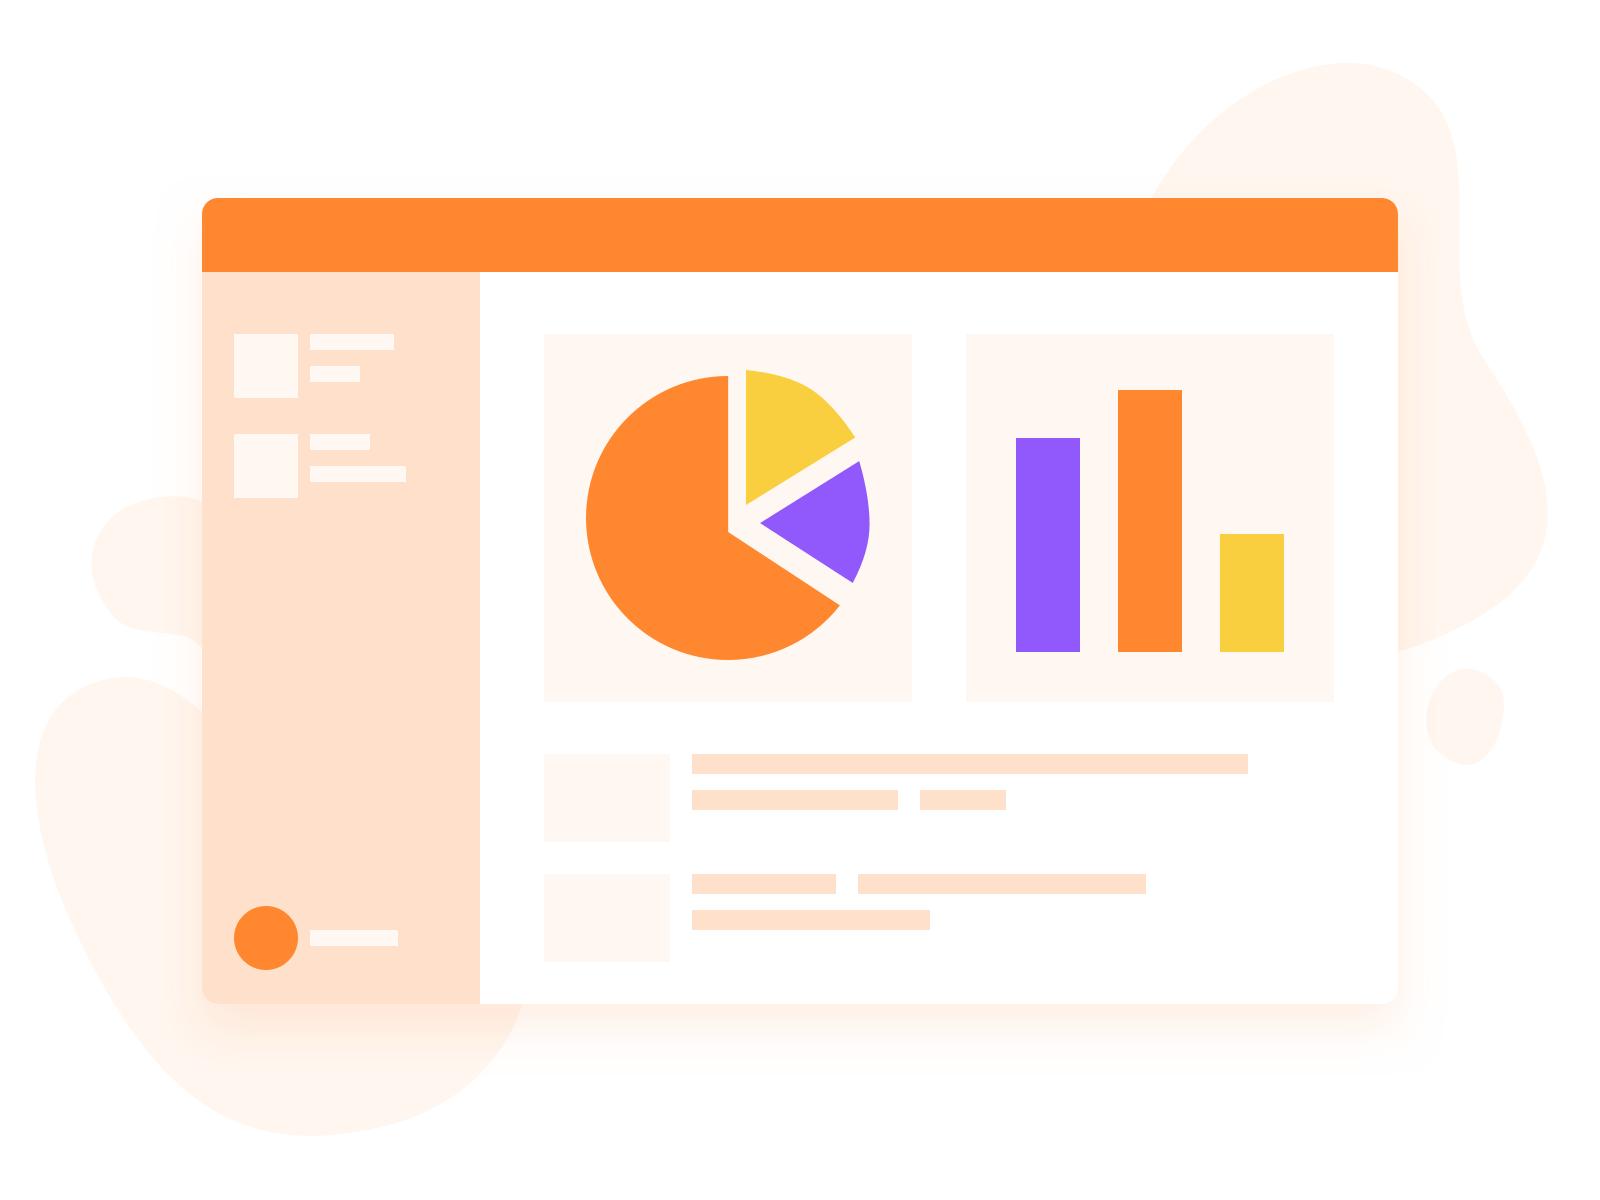 content marketing metrics to track